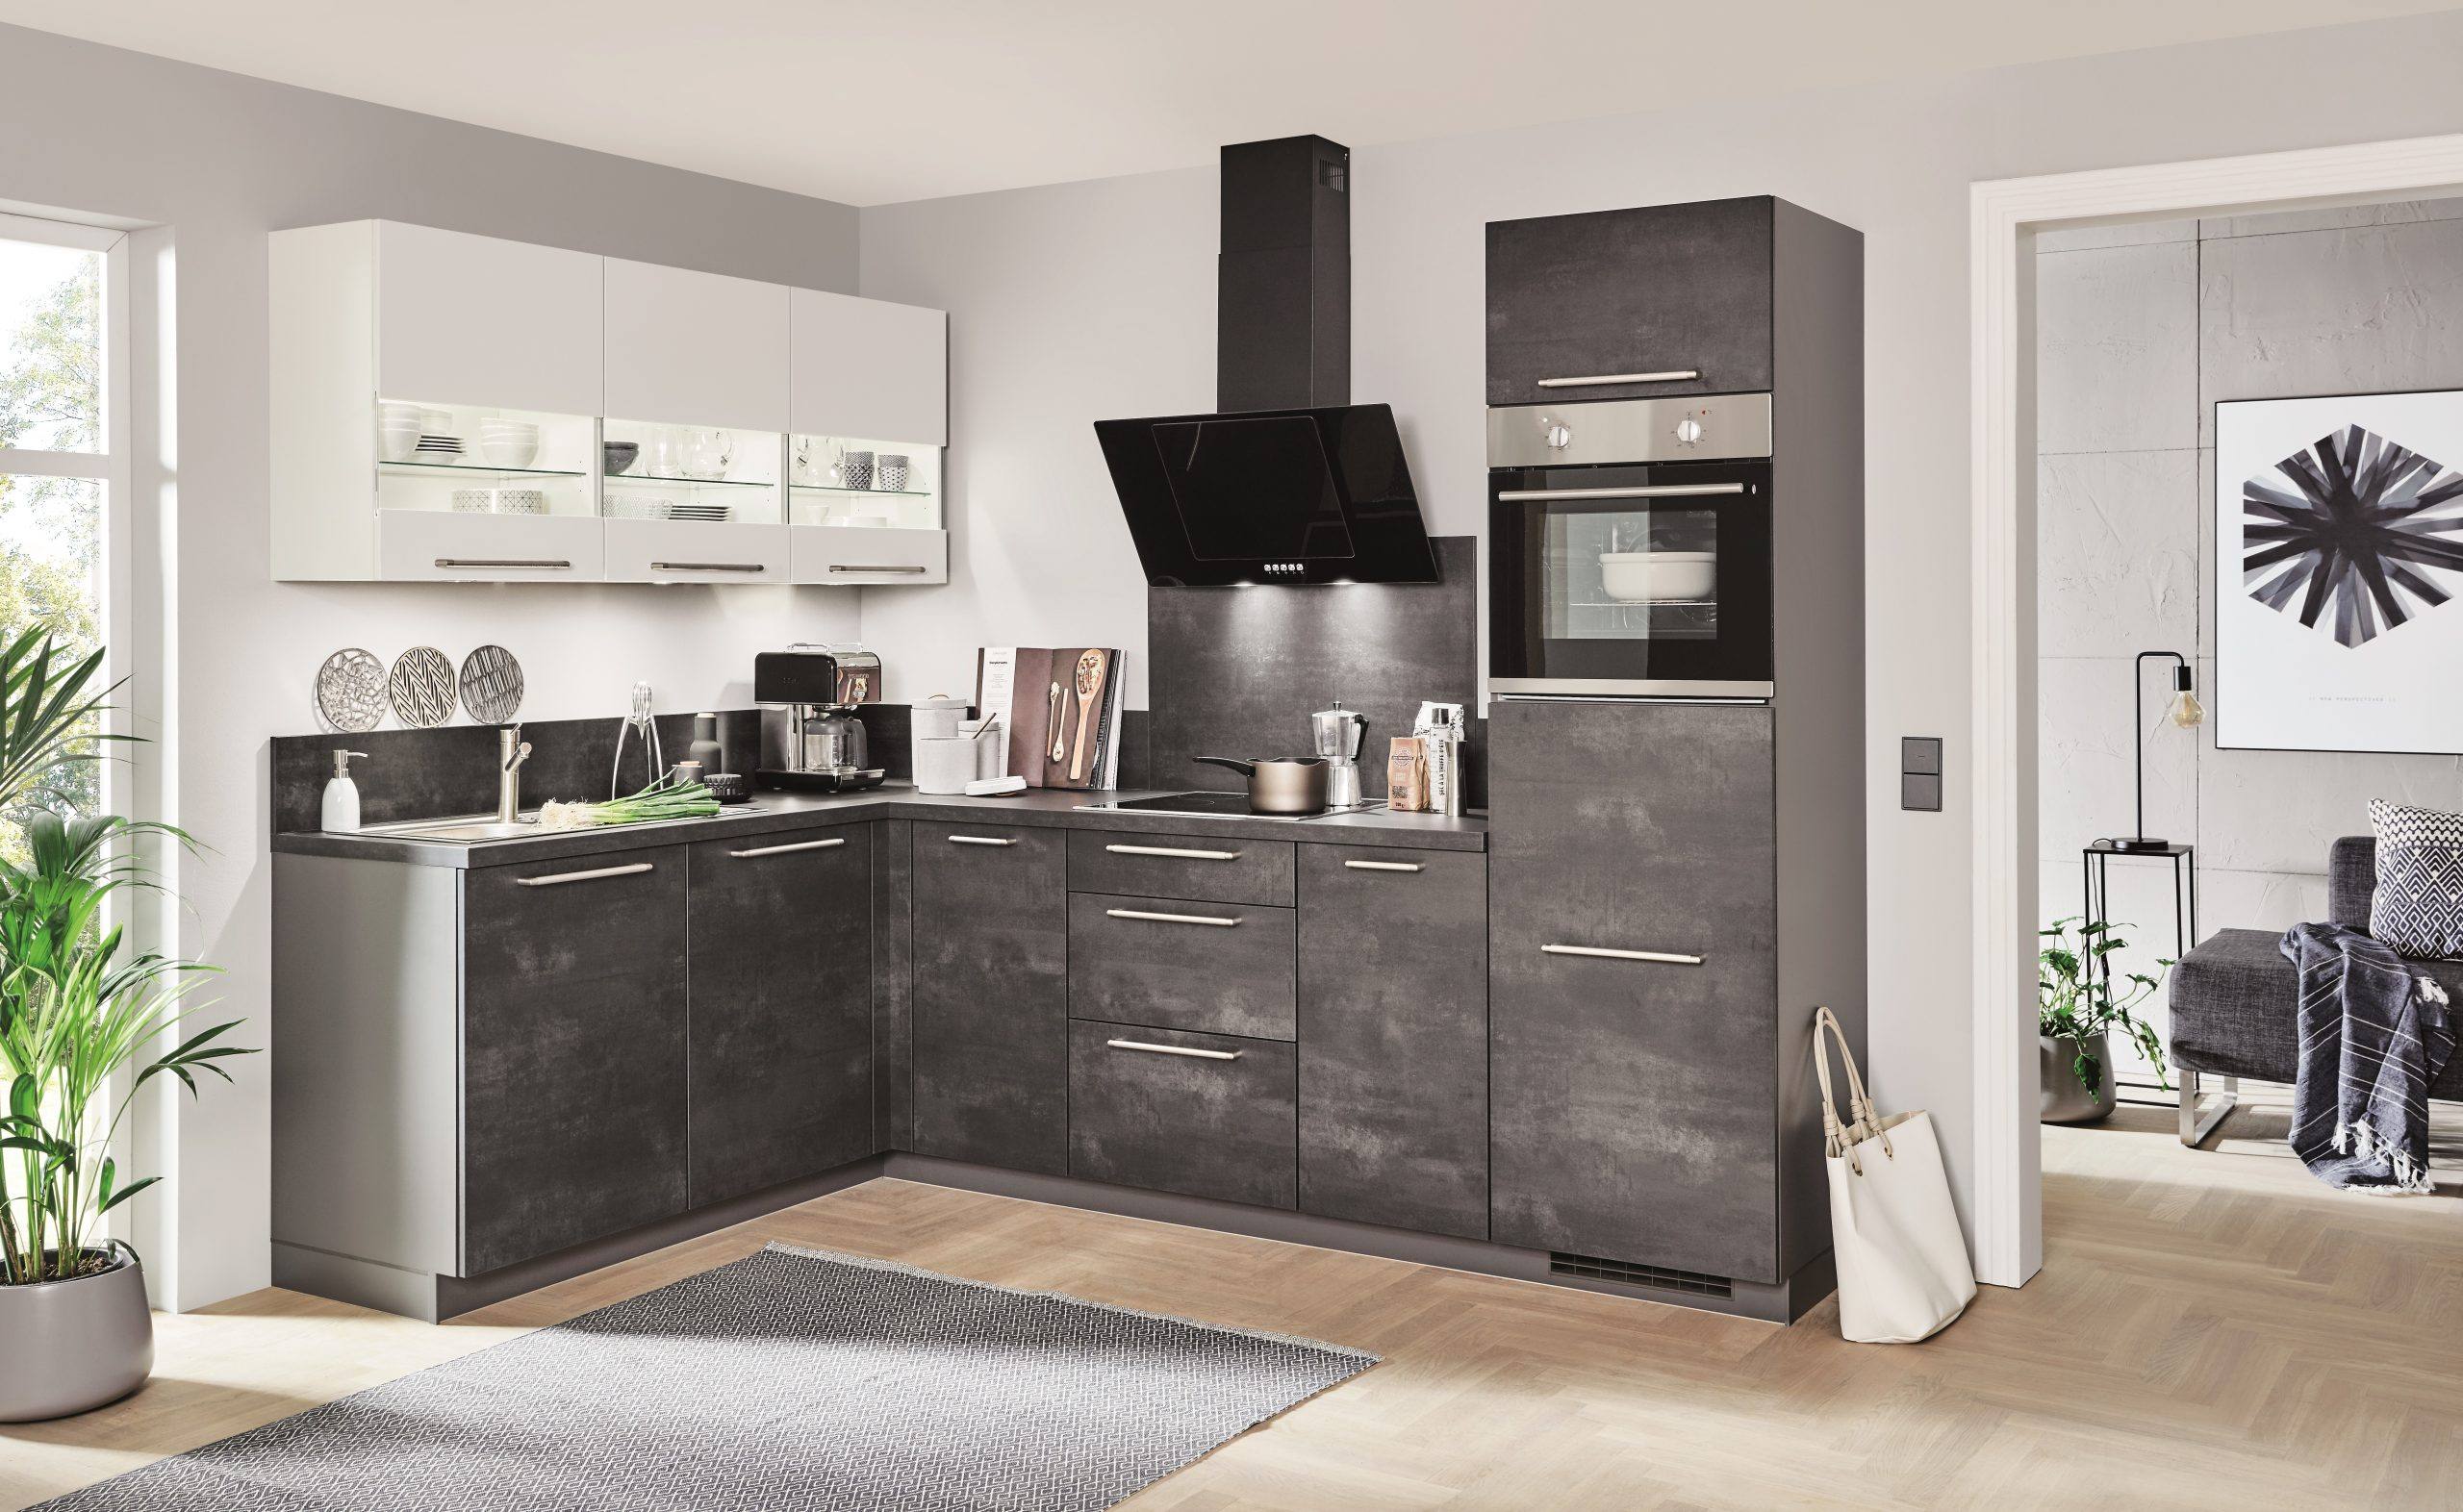 Full Size of Nobilia Küche Ohne Geräte Moderne Küche Ohne Geräte Küche Ohne Geräte Erfahrungen Günstige Küche Ohne Geräte Küche Küche Ohne Geräte